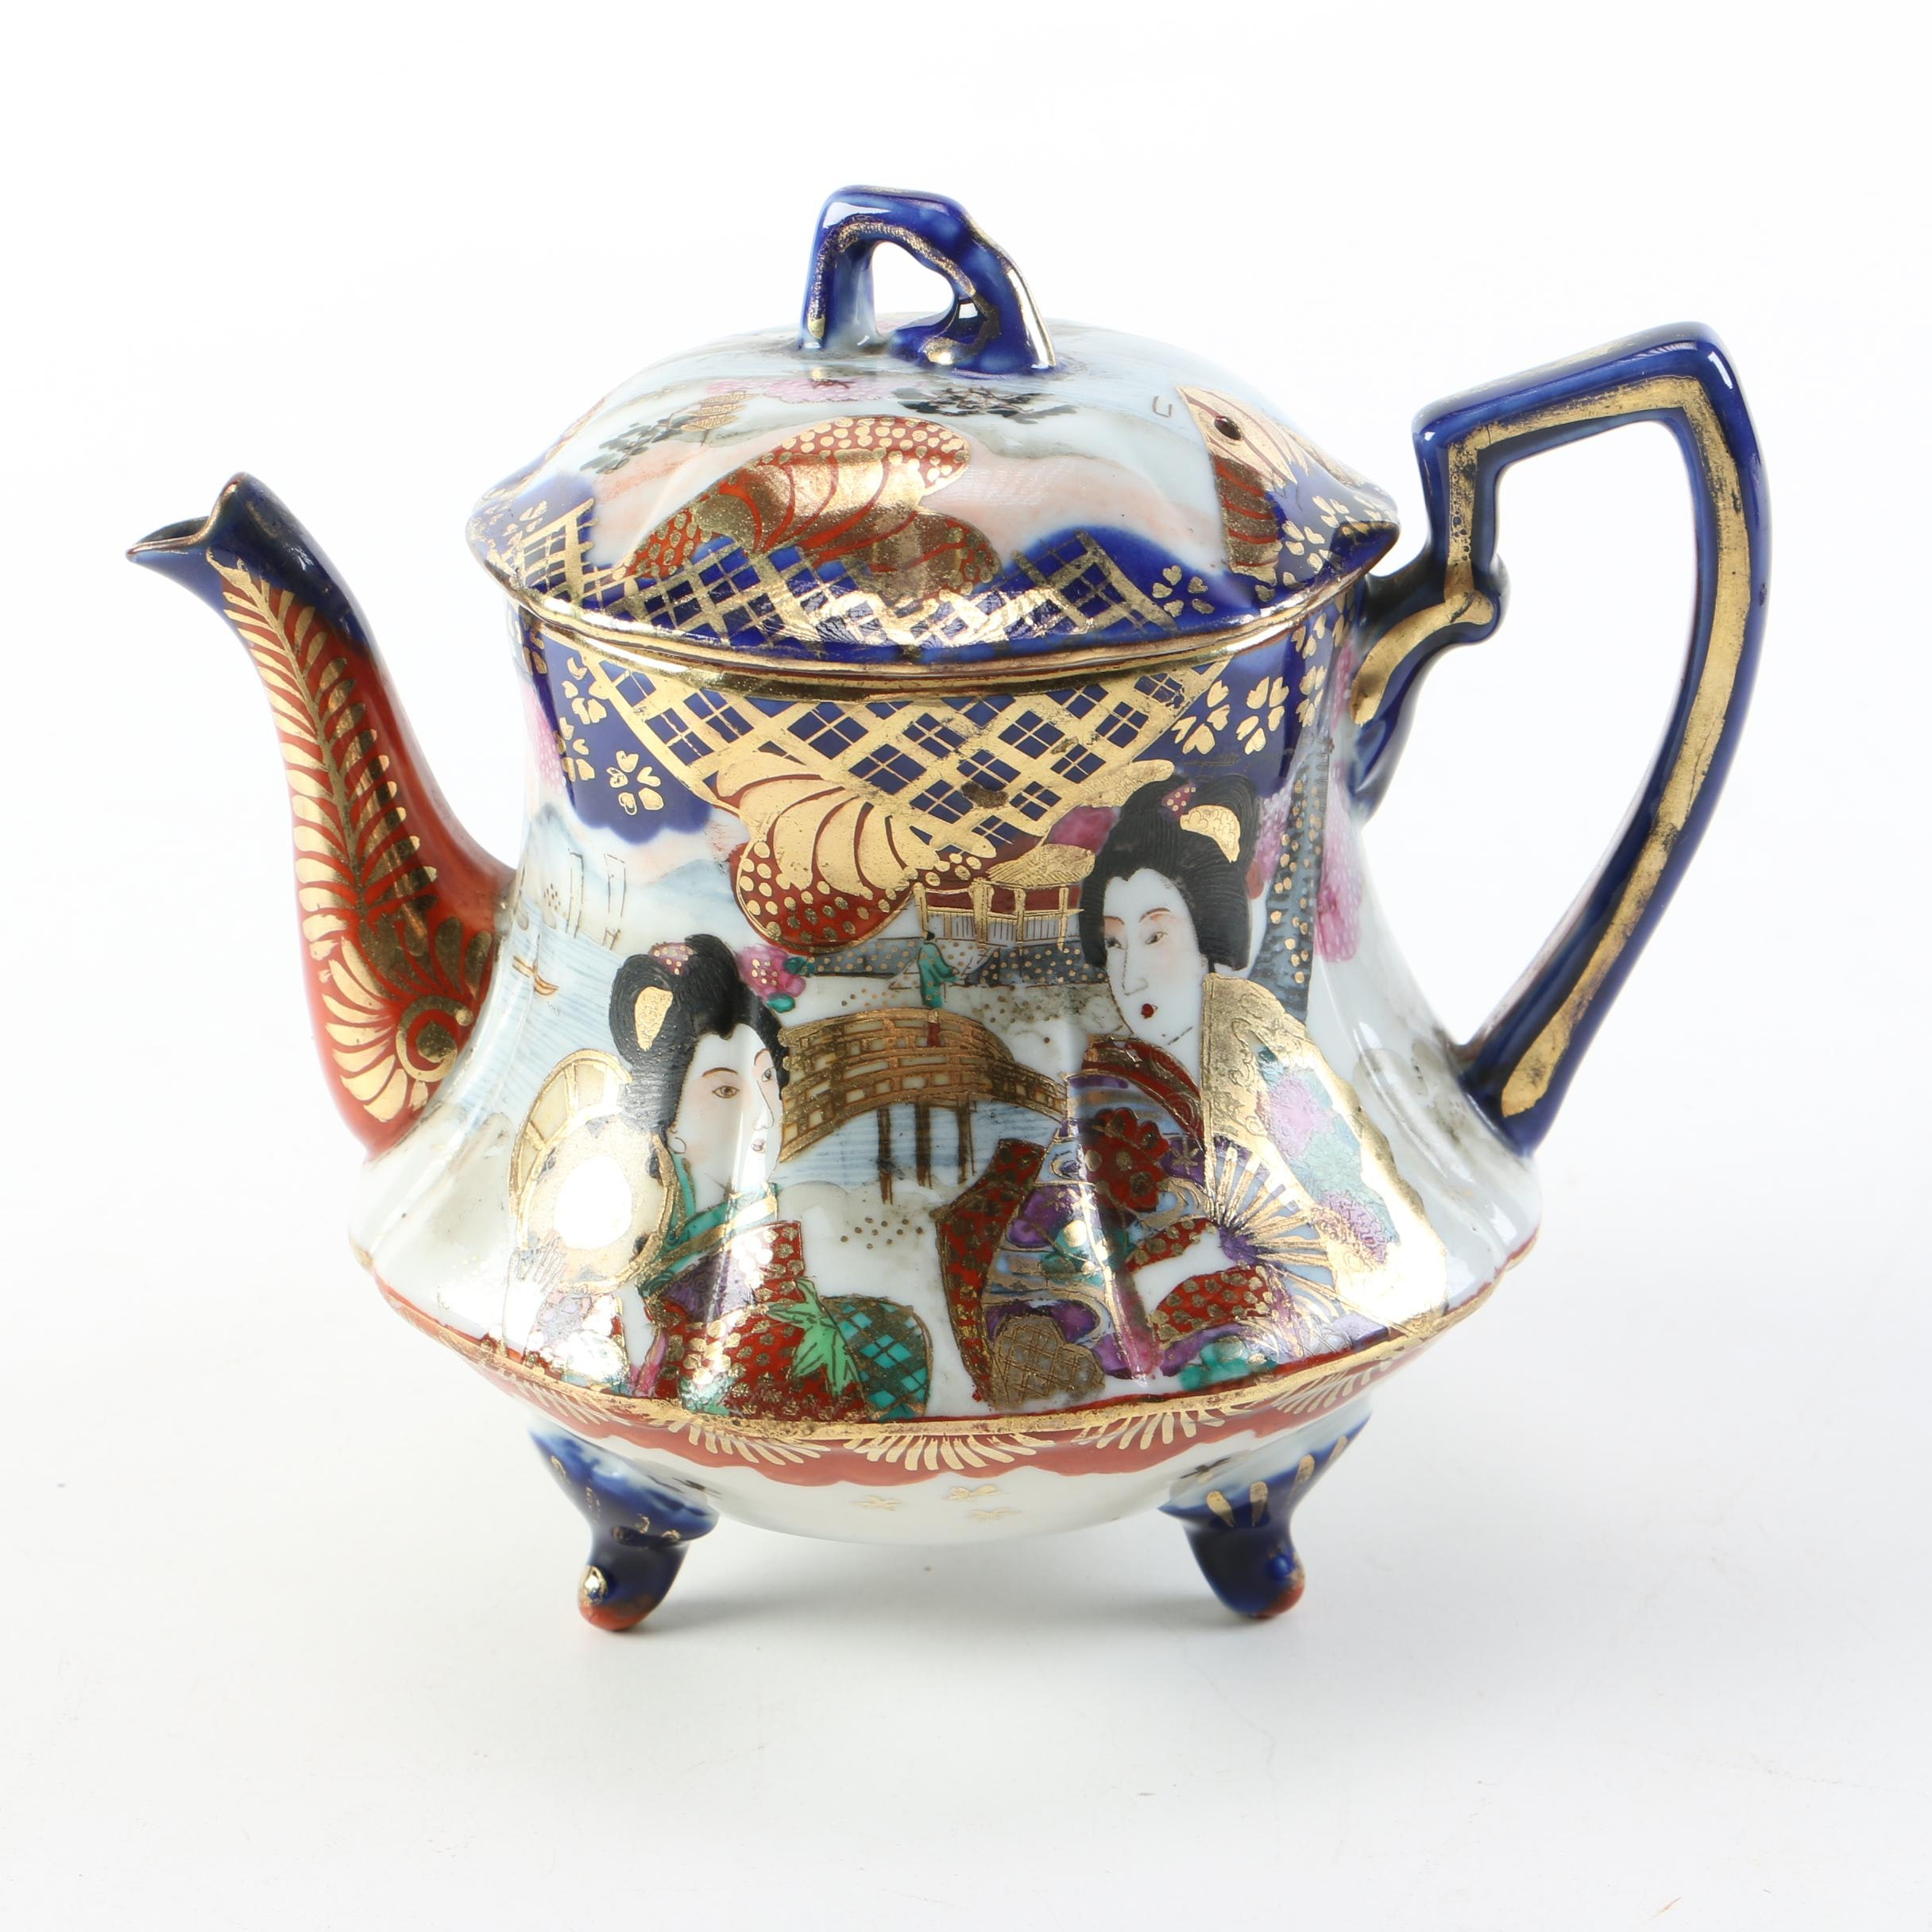 Vintage Japanese Porcelain Teapot